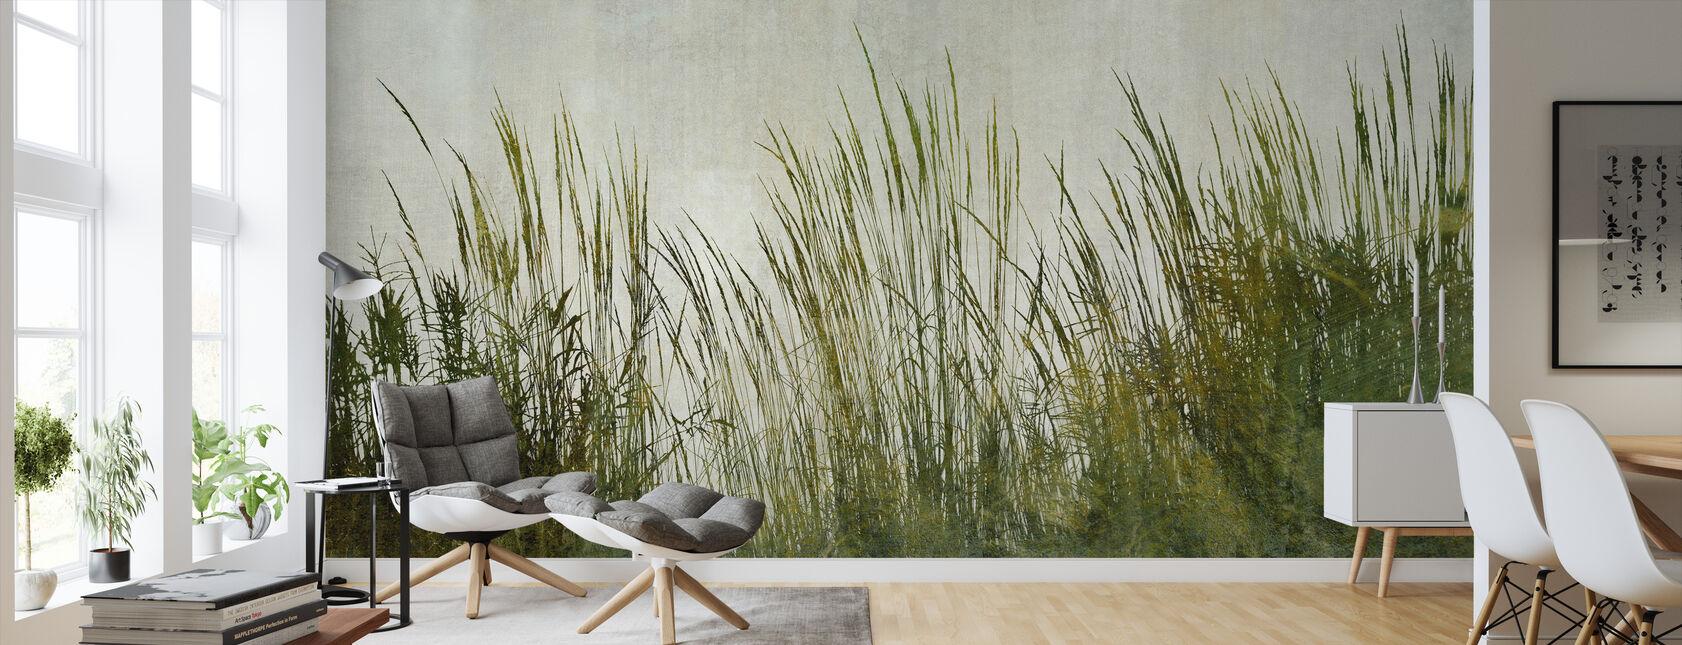 Green Grass Silhouette - Wallpaper - Living Room